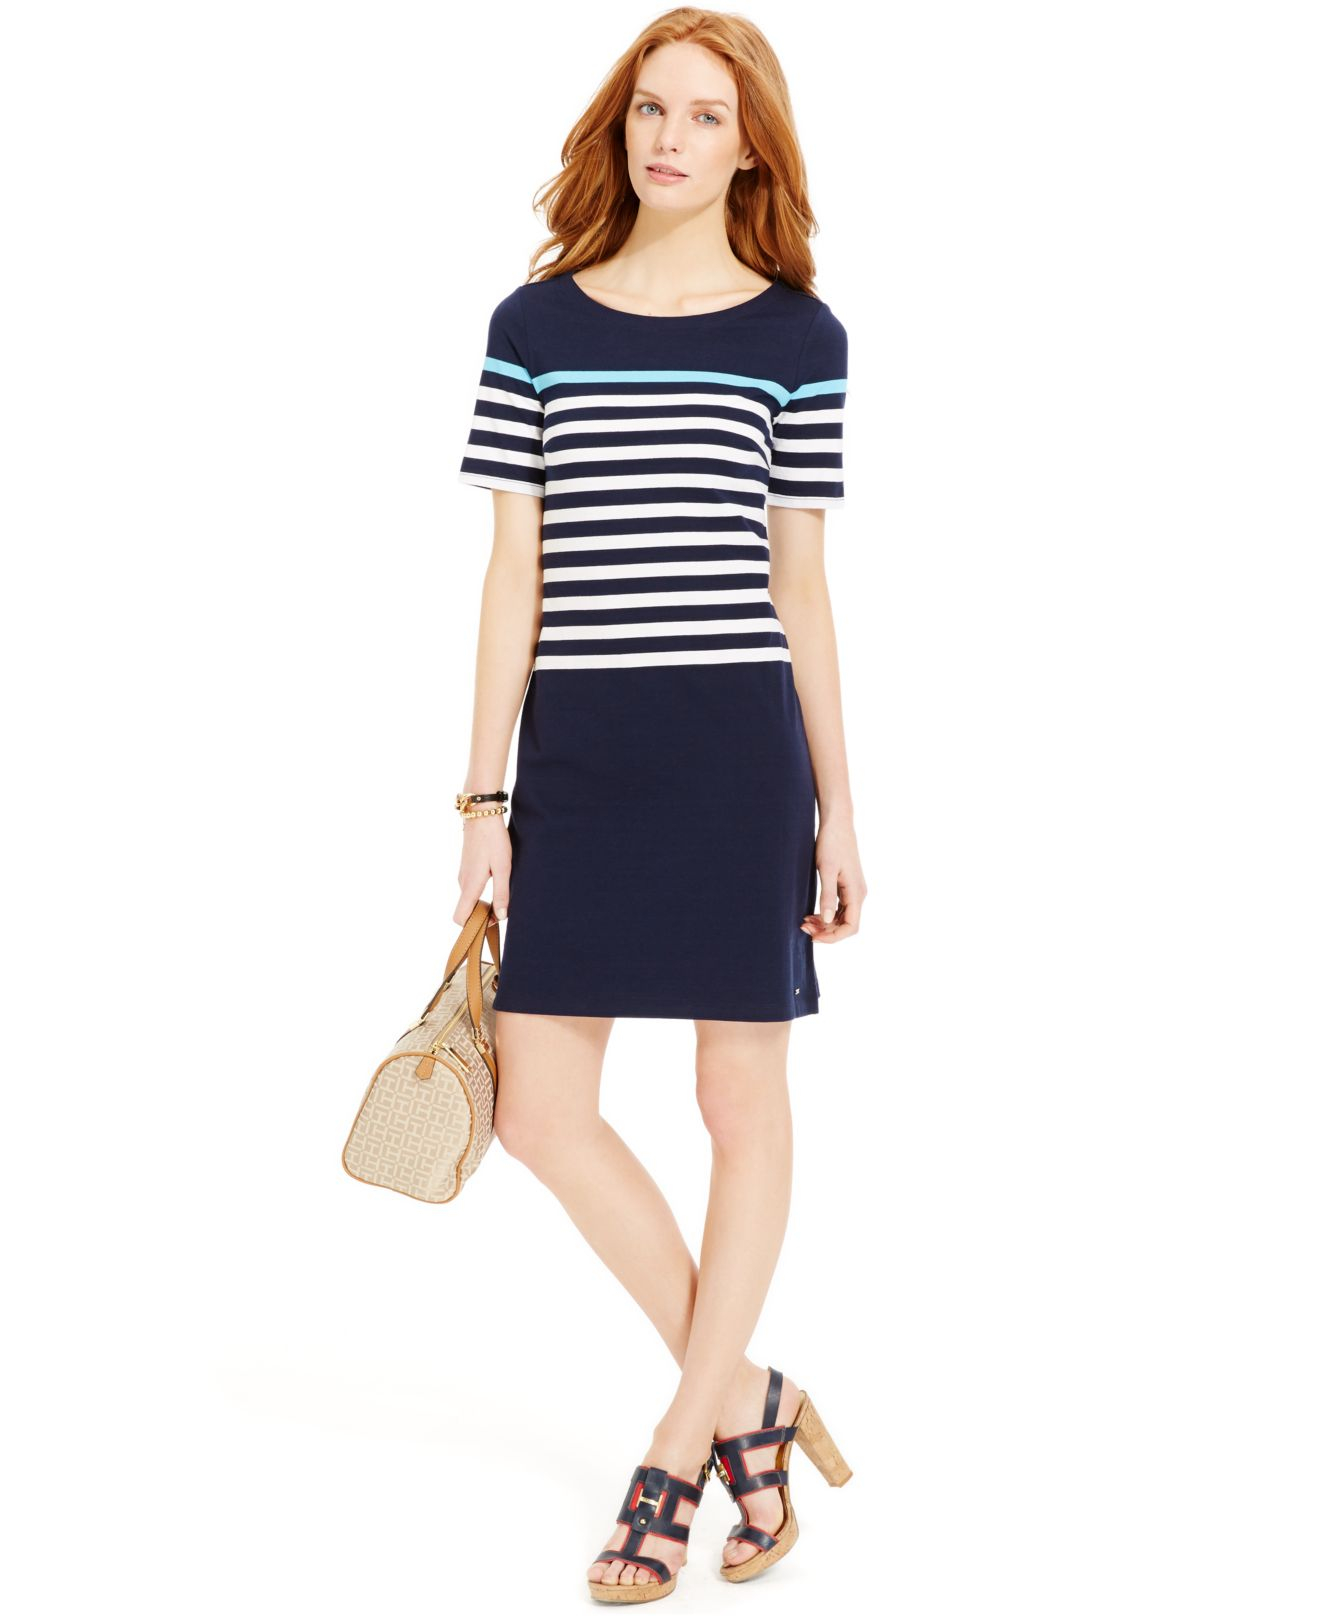 6abf5d833f Lyst - Tommy Hilfiger Colorblock Striped T-shirt Dress in Blue